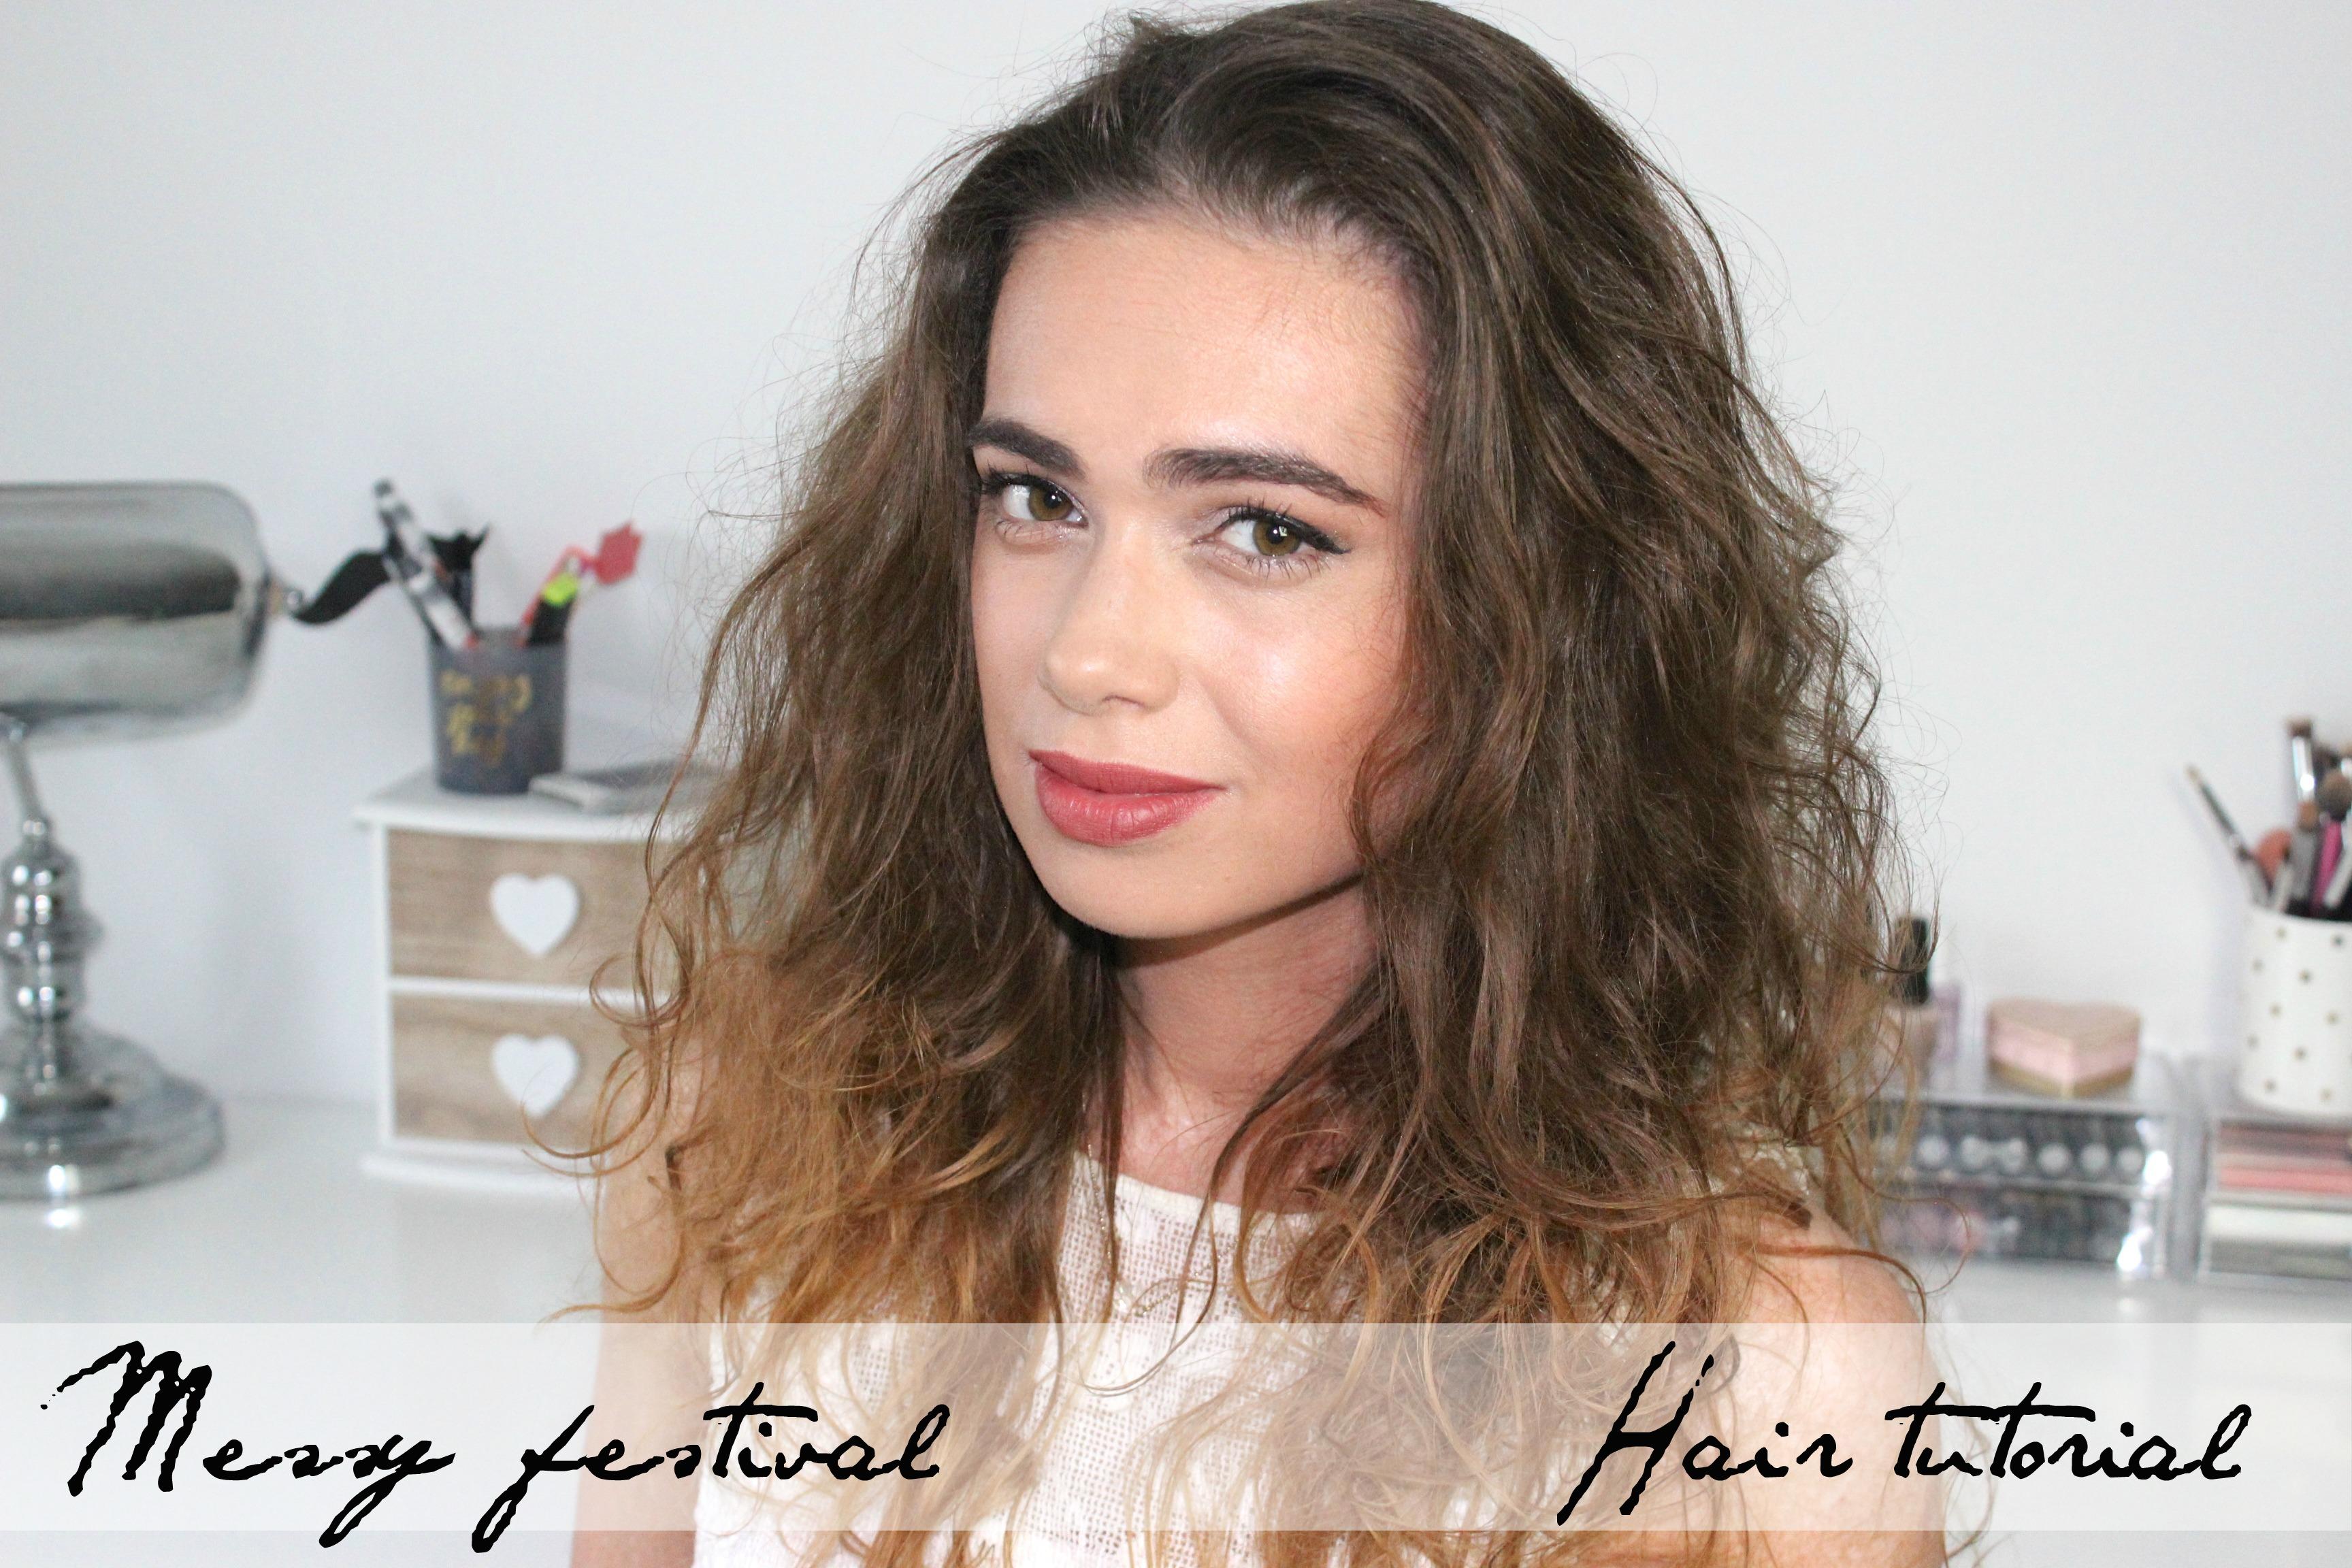 Messy Festival hair tutorial cover kopie